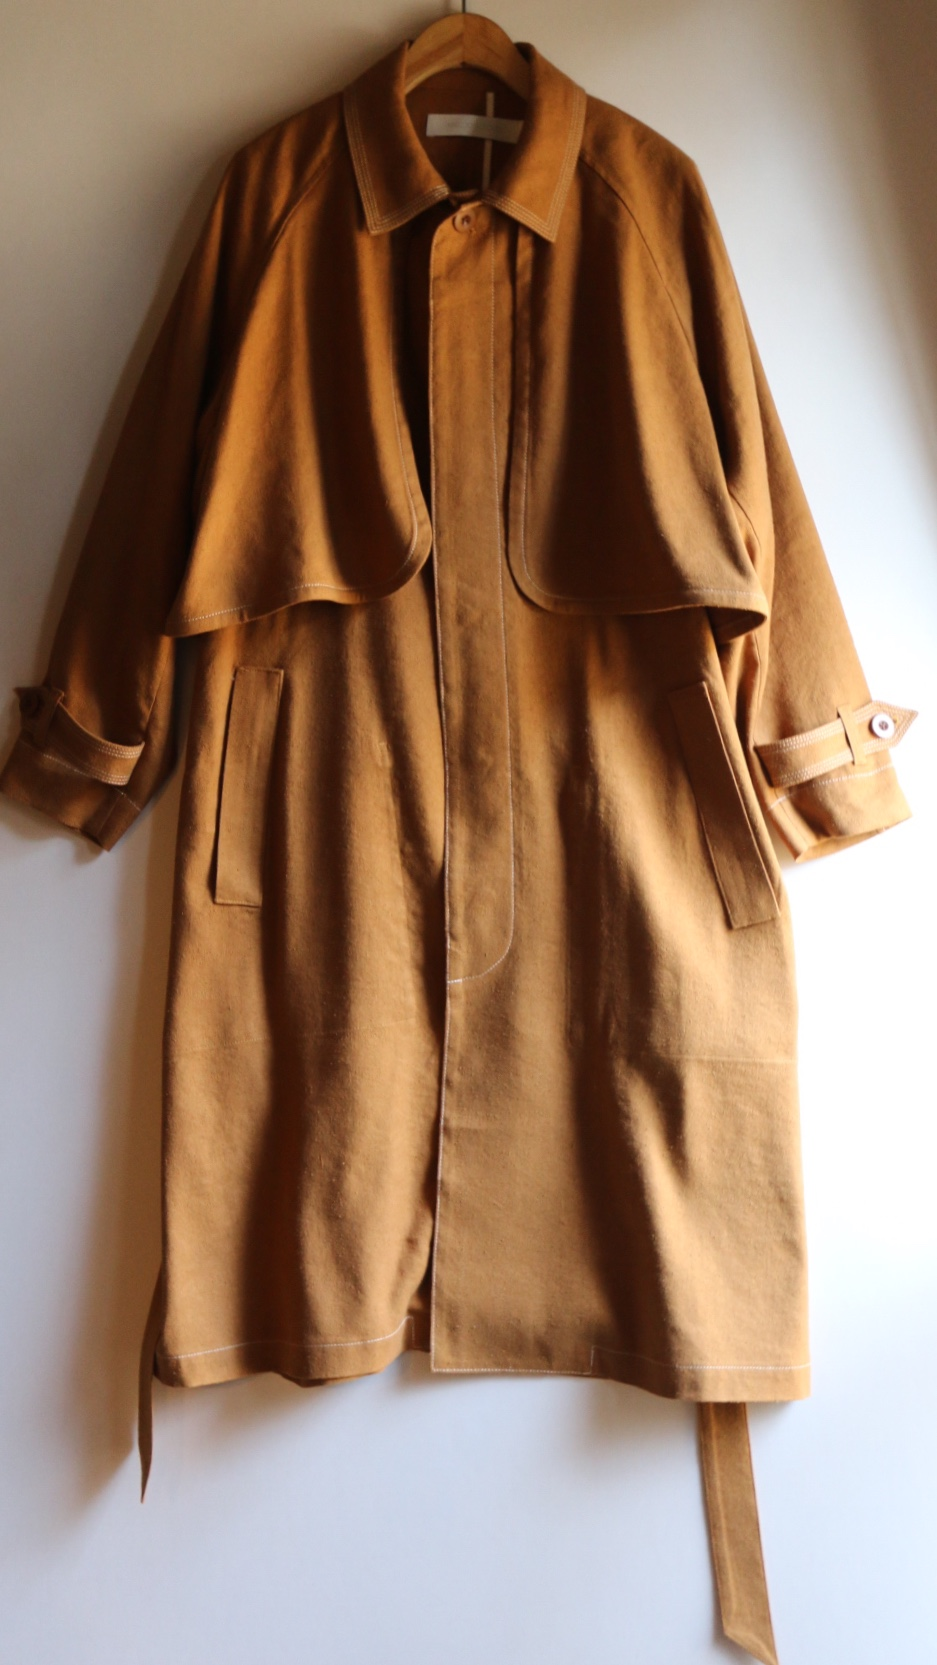 ASEEDONCLÖUD peasant coat